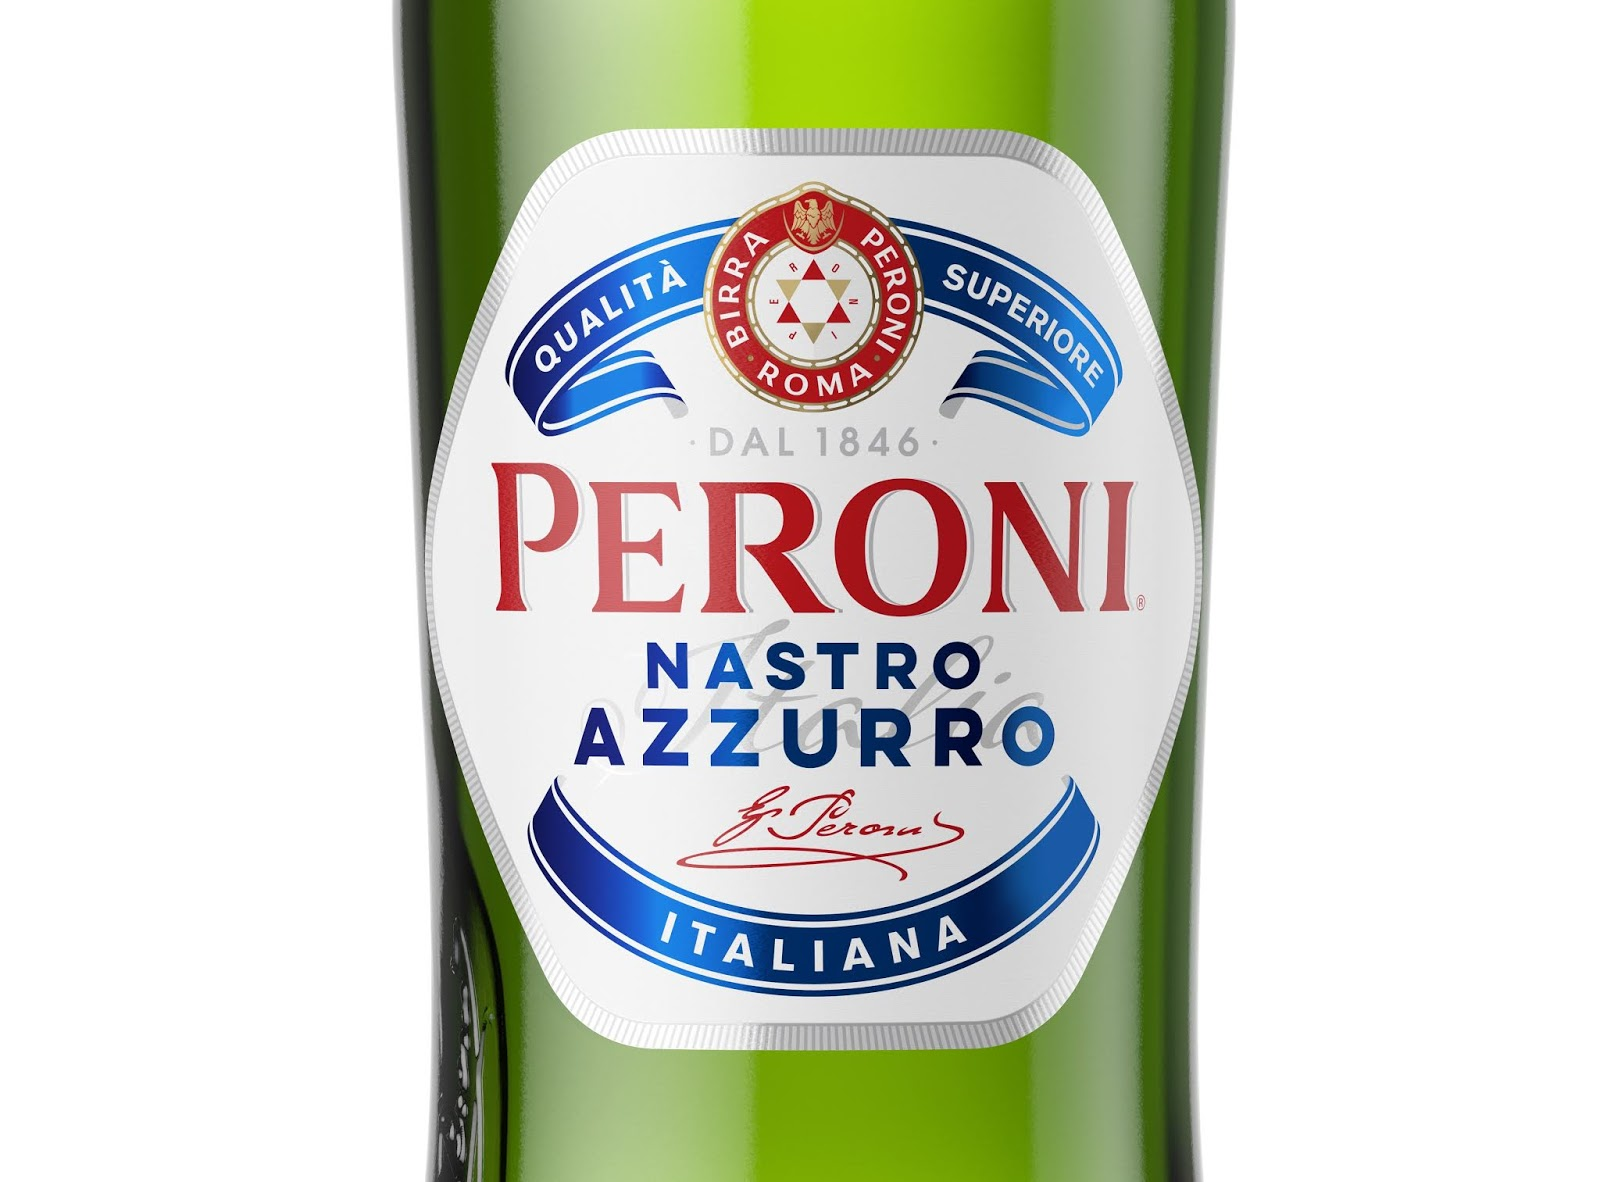 Peroni Nastro Azzuro.png